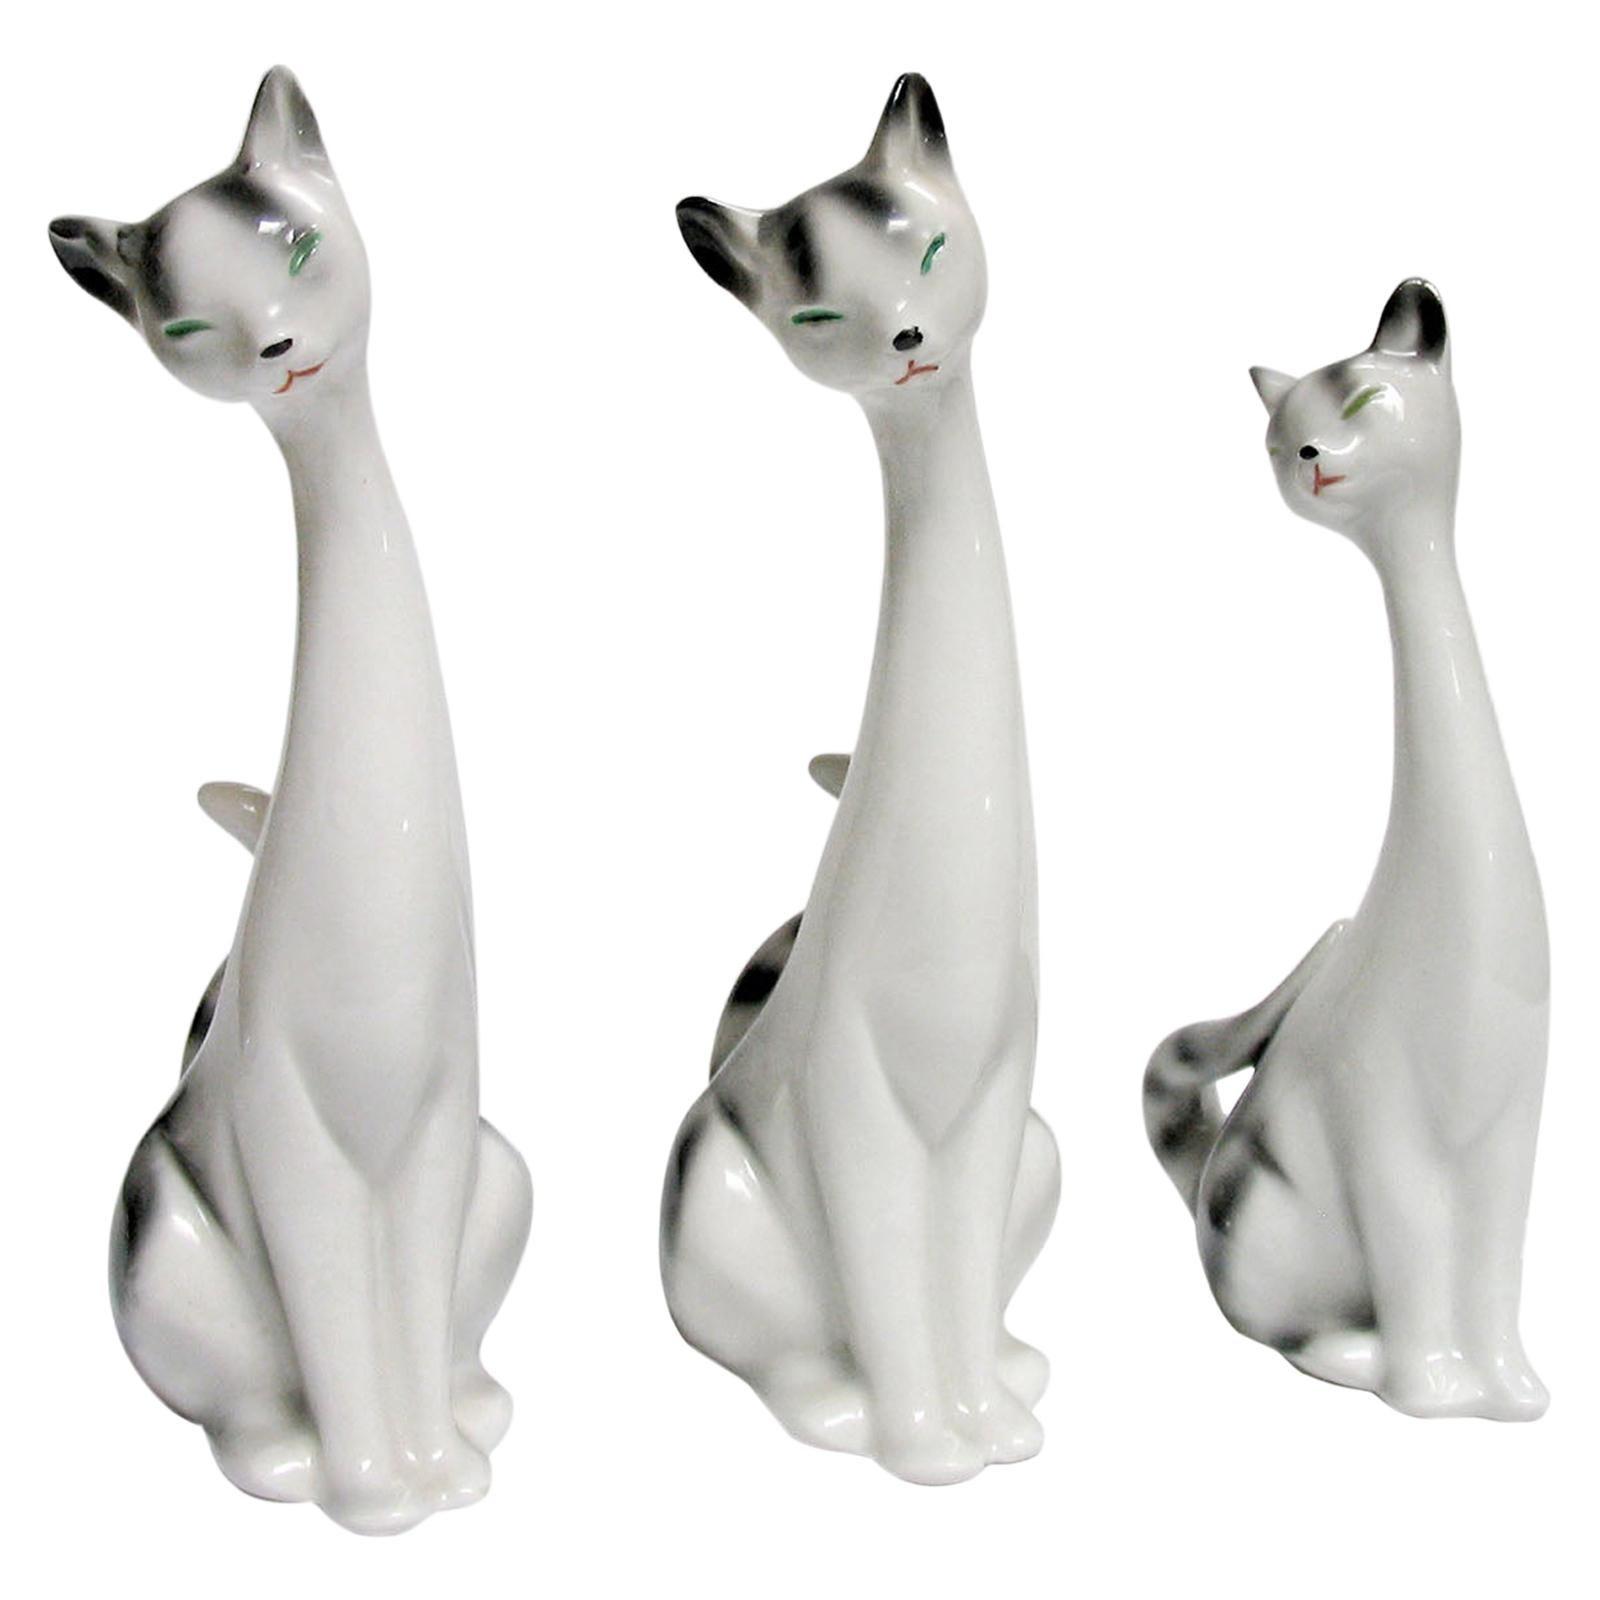 Mid-Century Modern Decorative Ceramic Cats, Sweden, 1970s